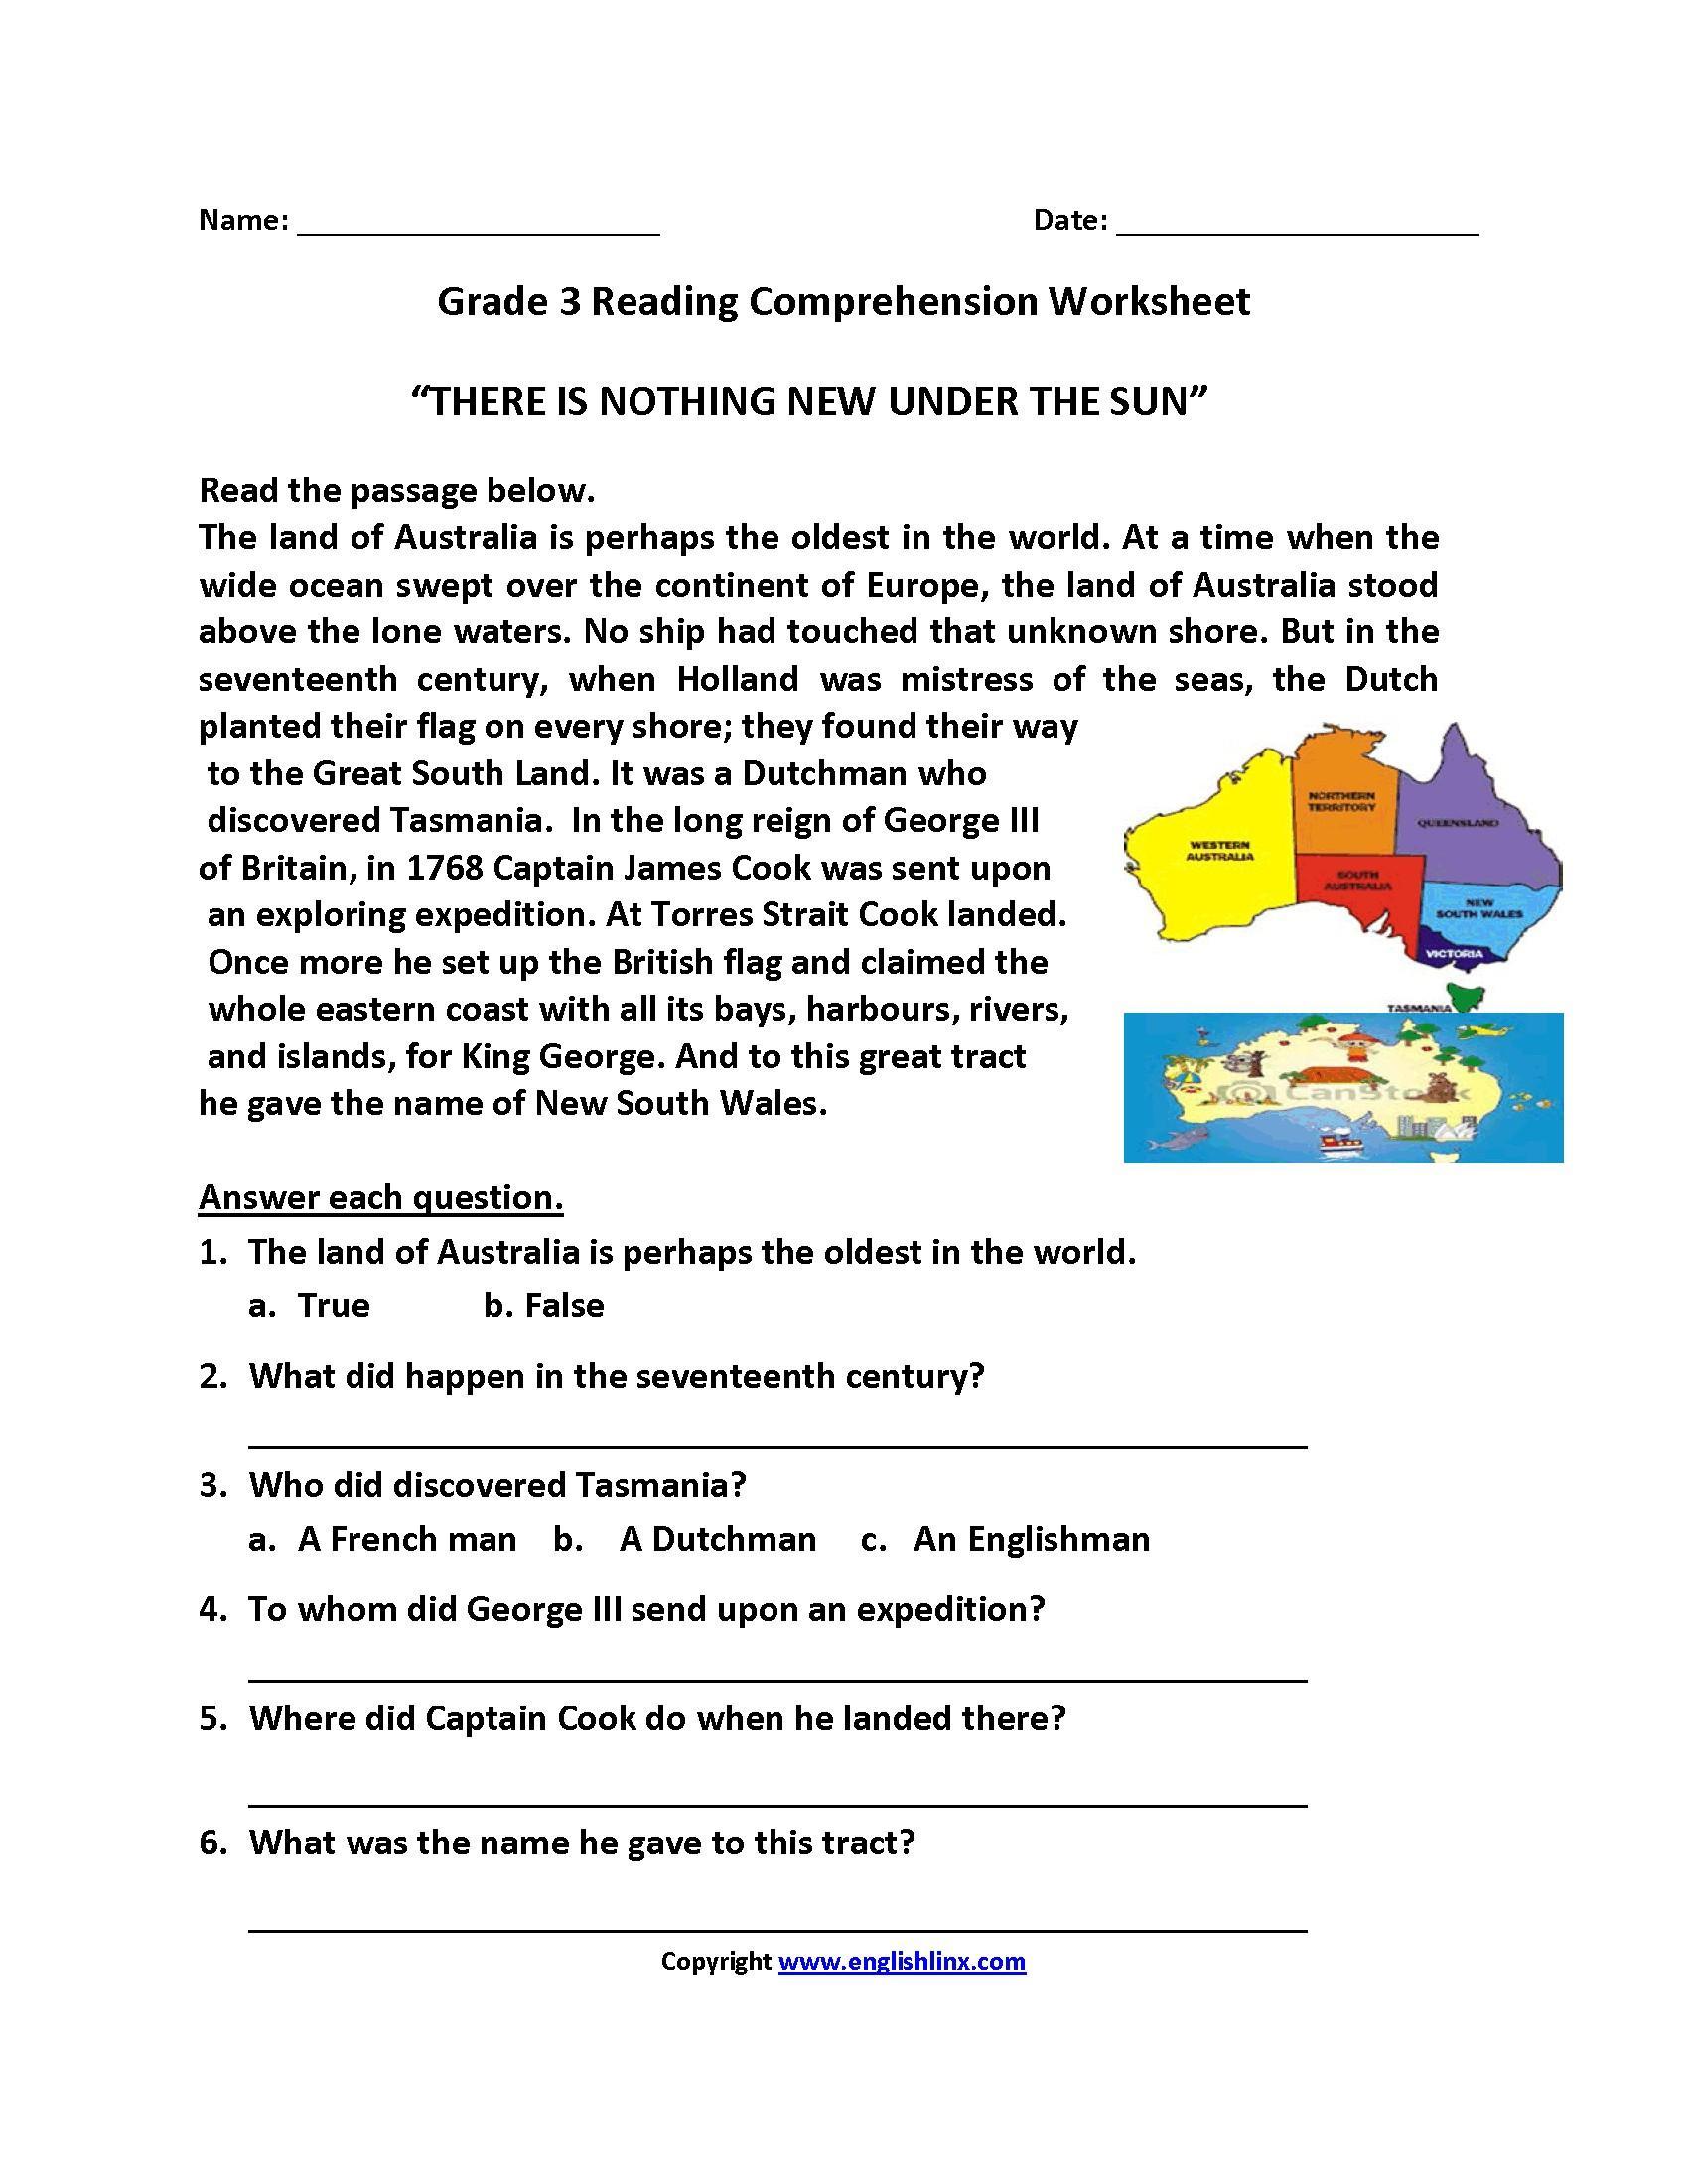 Worksheet On Phrasal Verbs For Grade 4